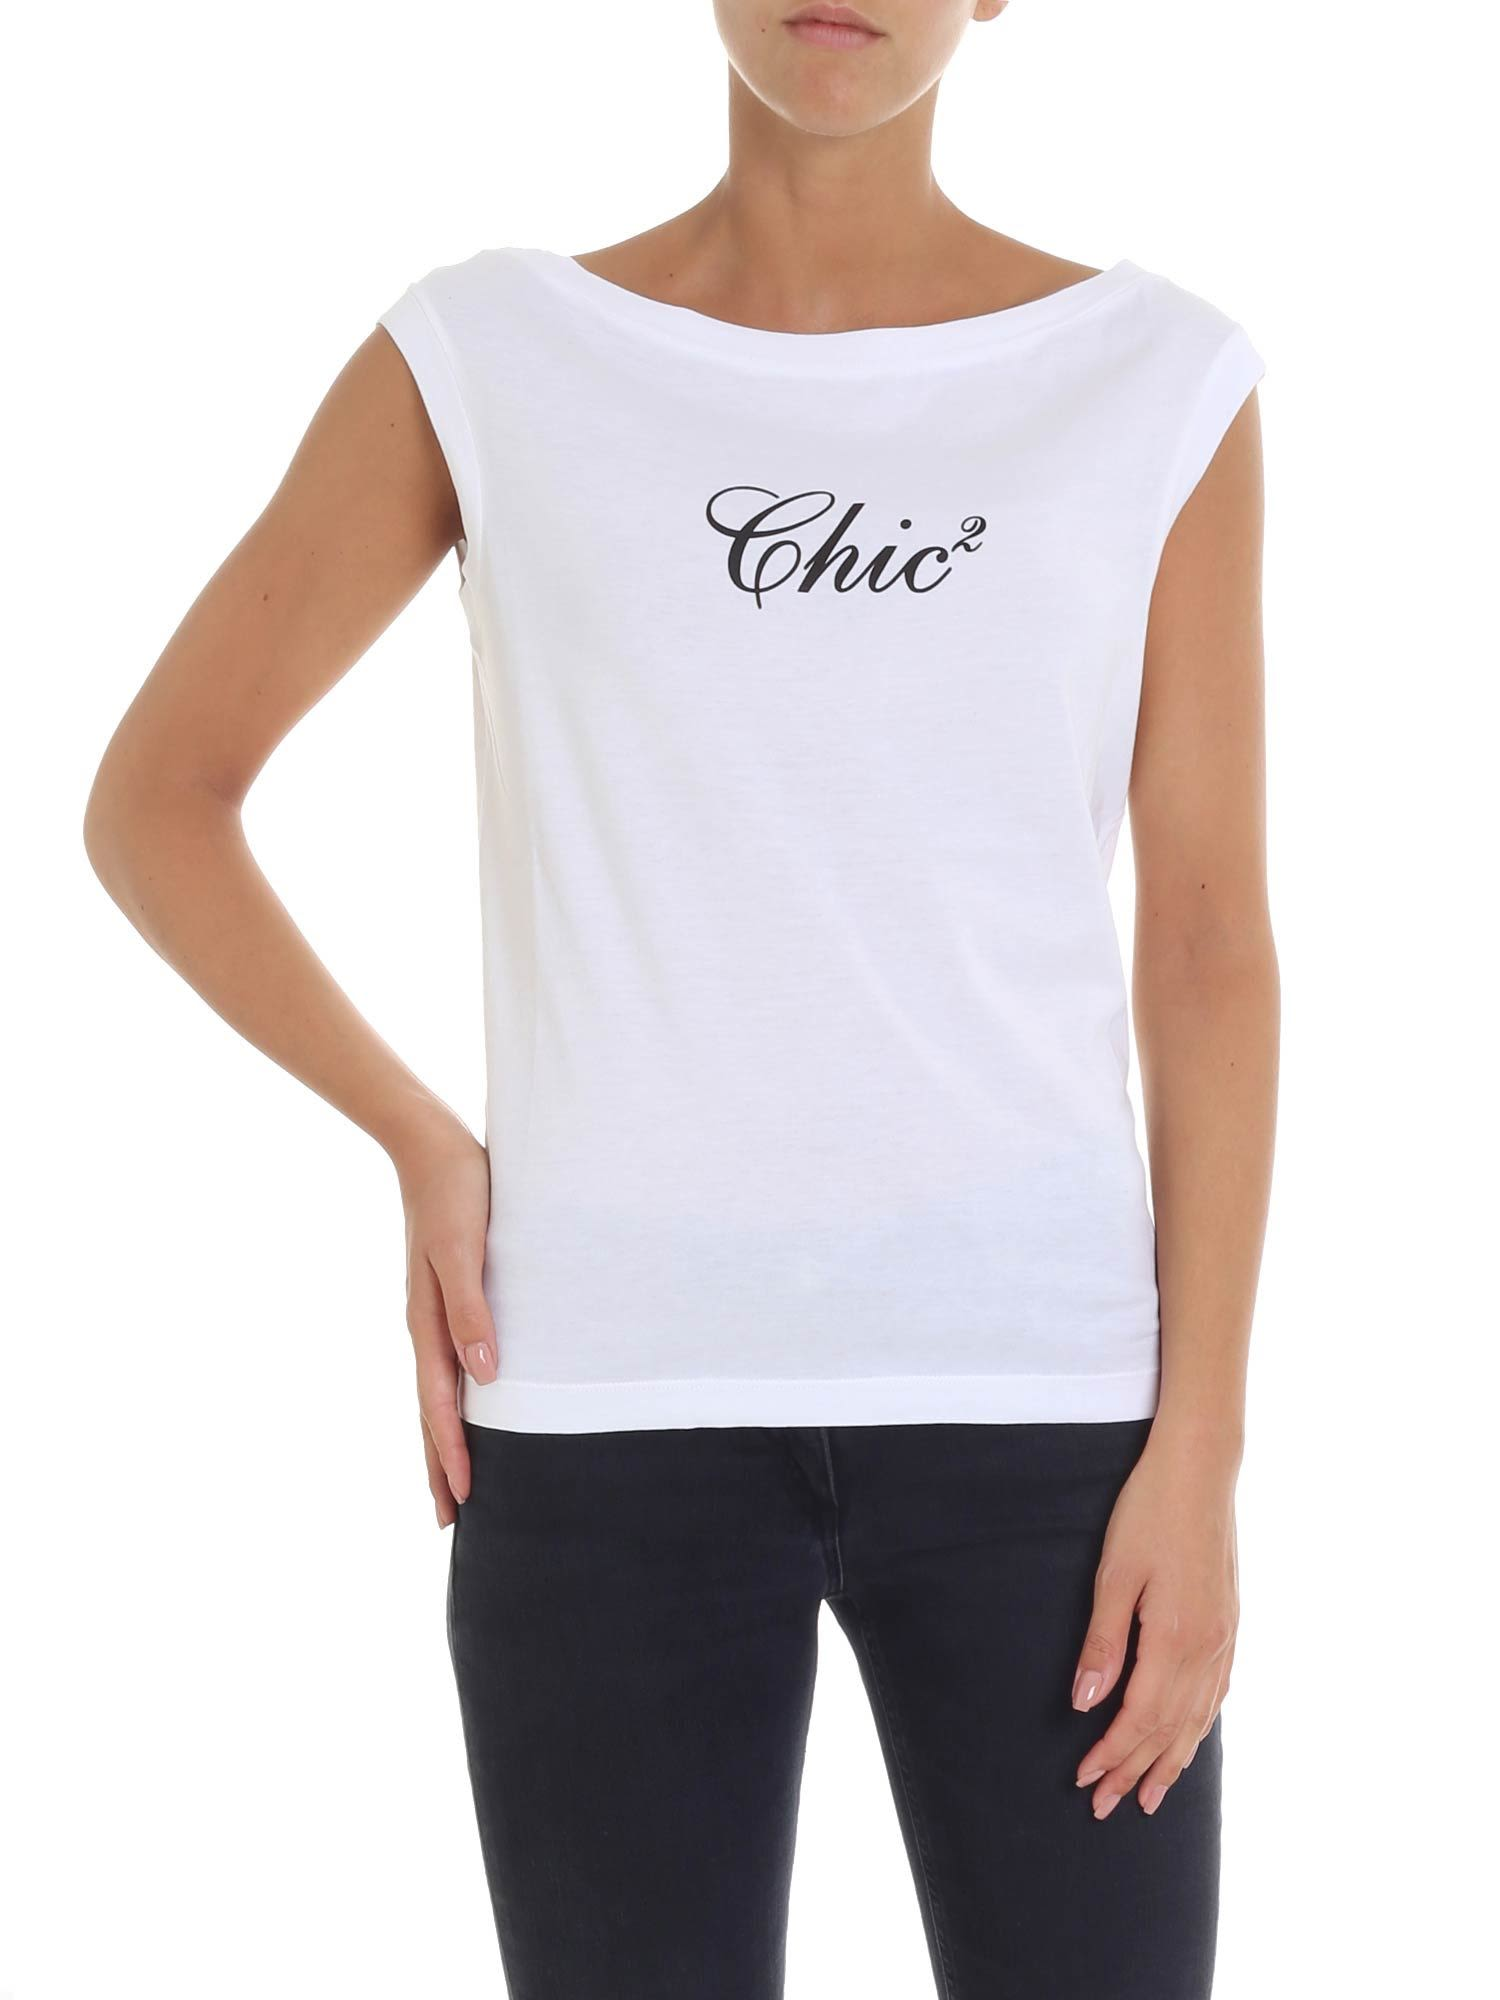 Dsquared2 Chic Slogan Print Tank Top